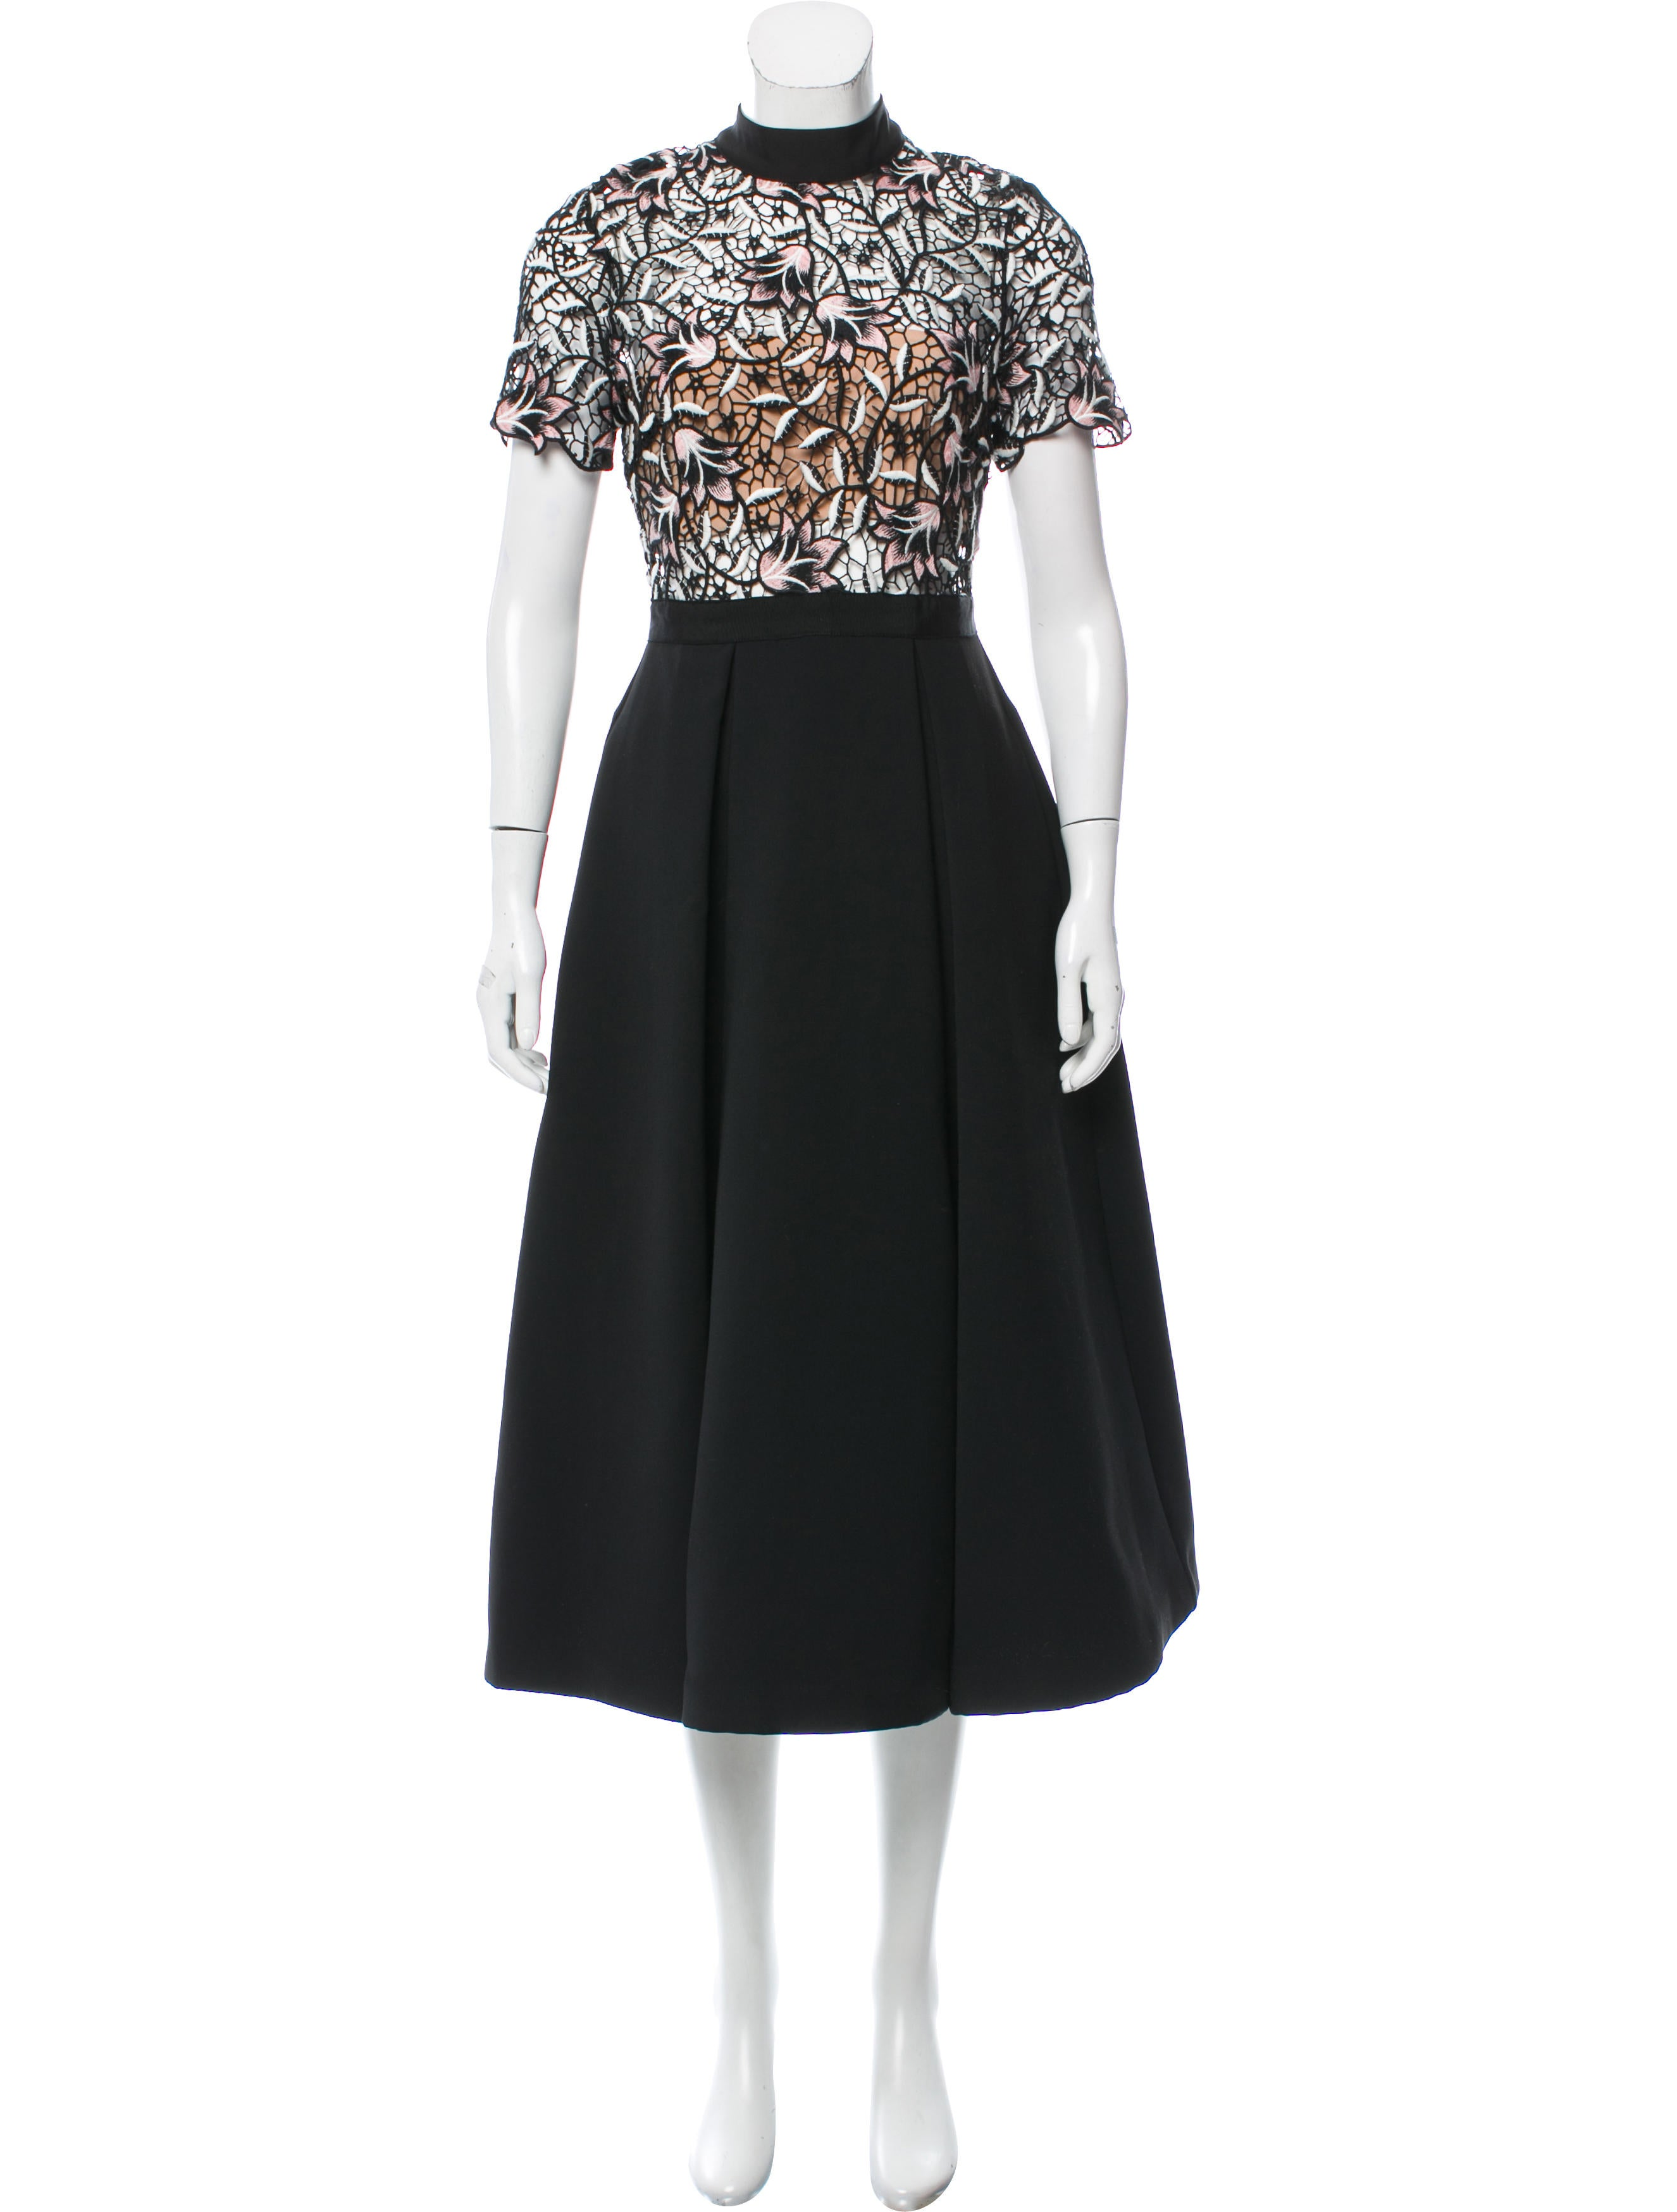 e56fe54f6ec1 Self-Portrait Nightshade Midi Dress - Clothing - WSELF22717 | The RealReal